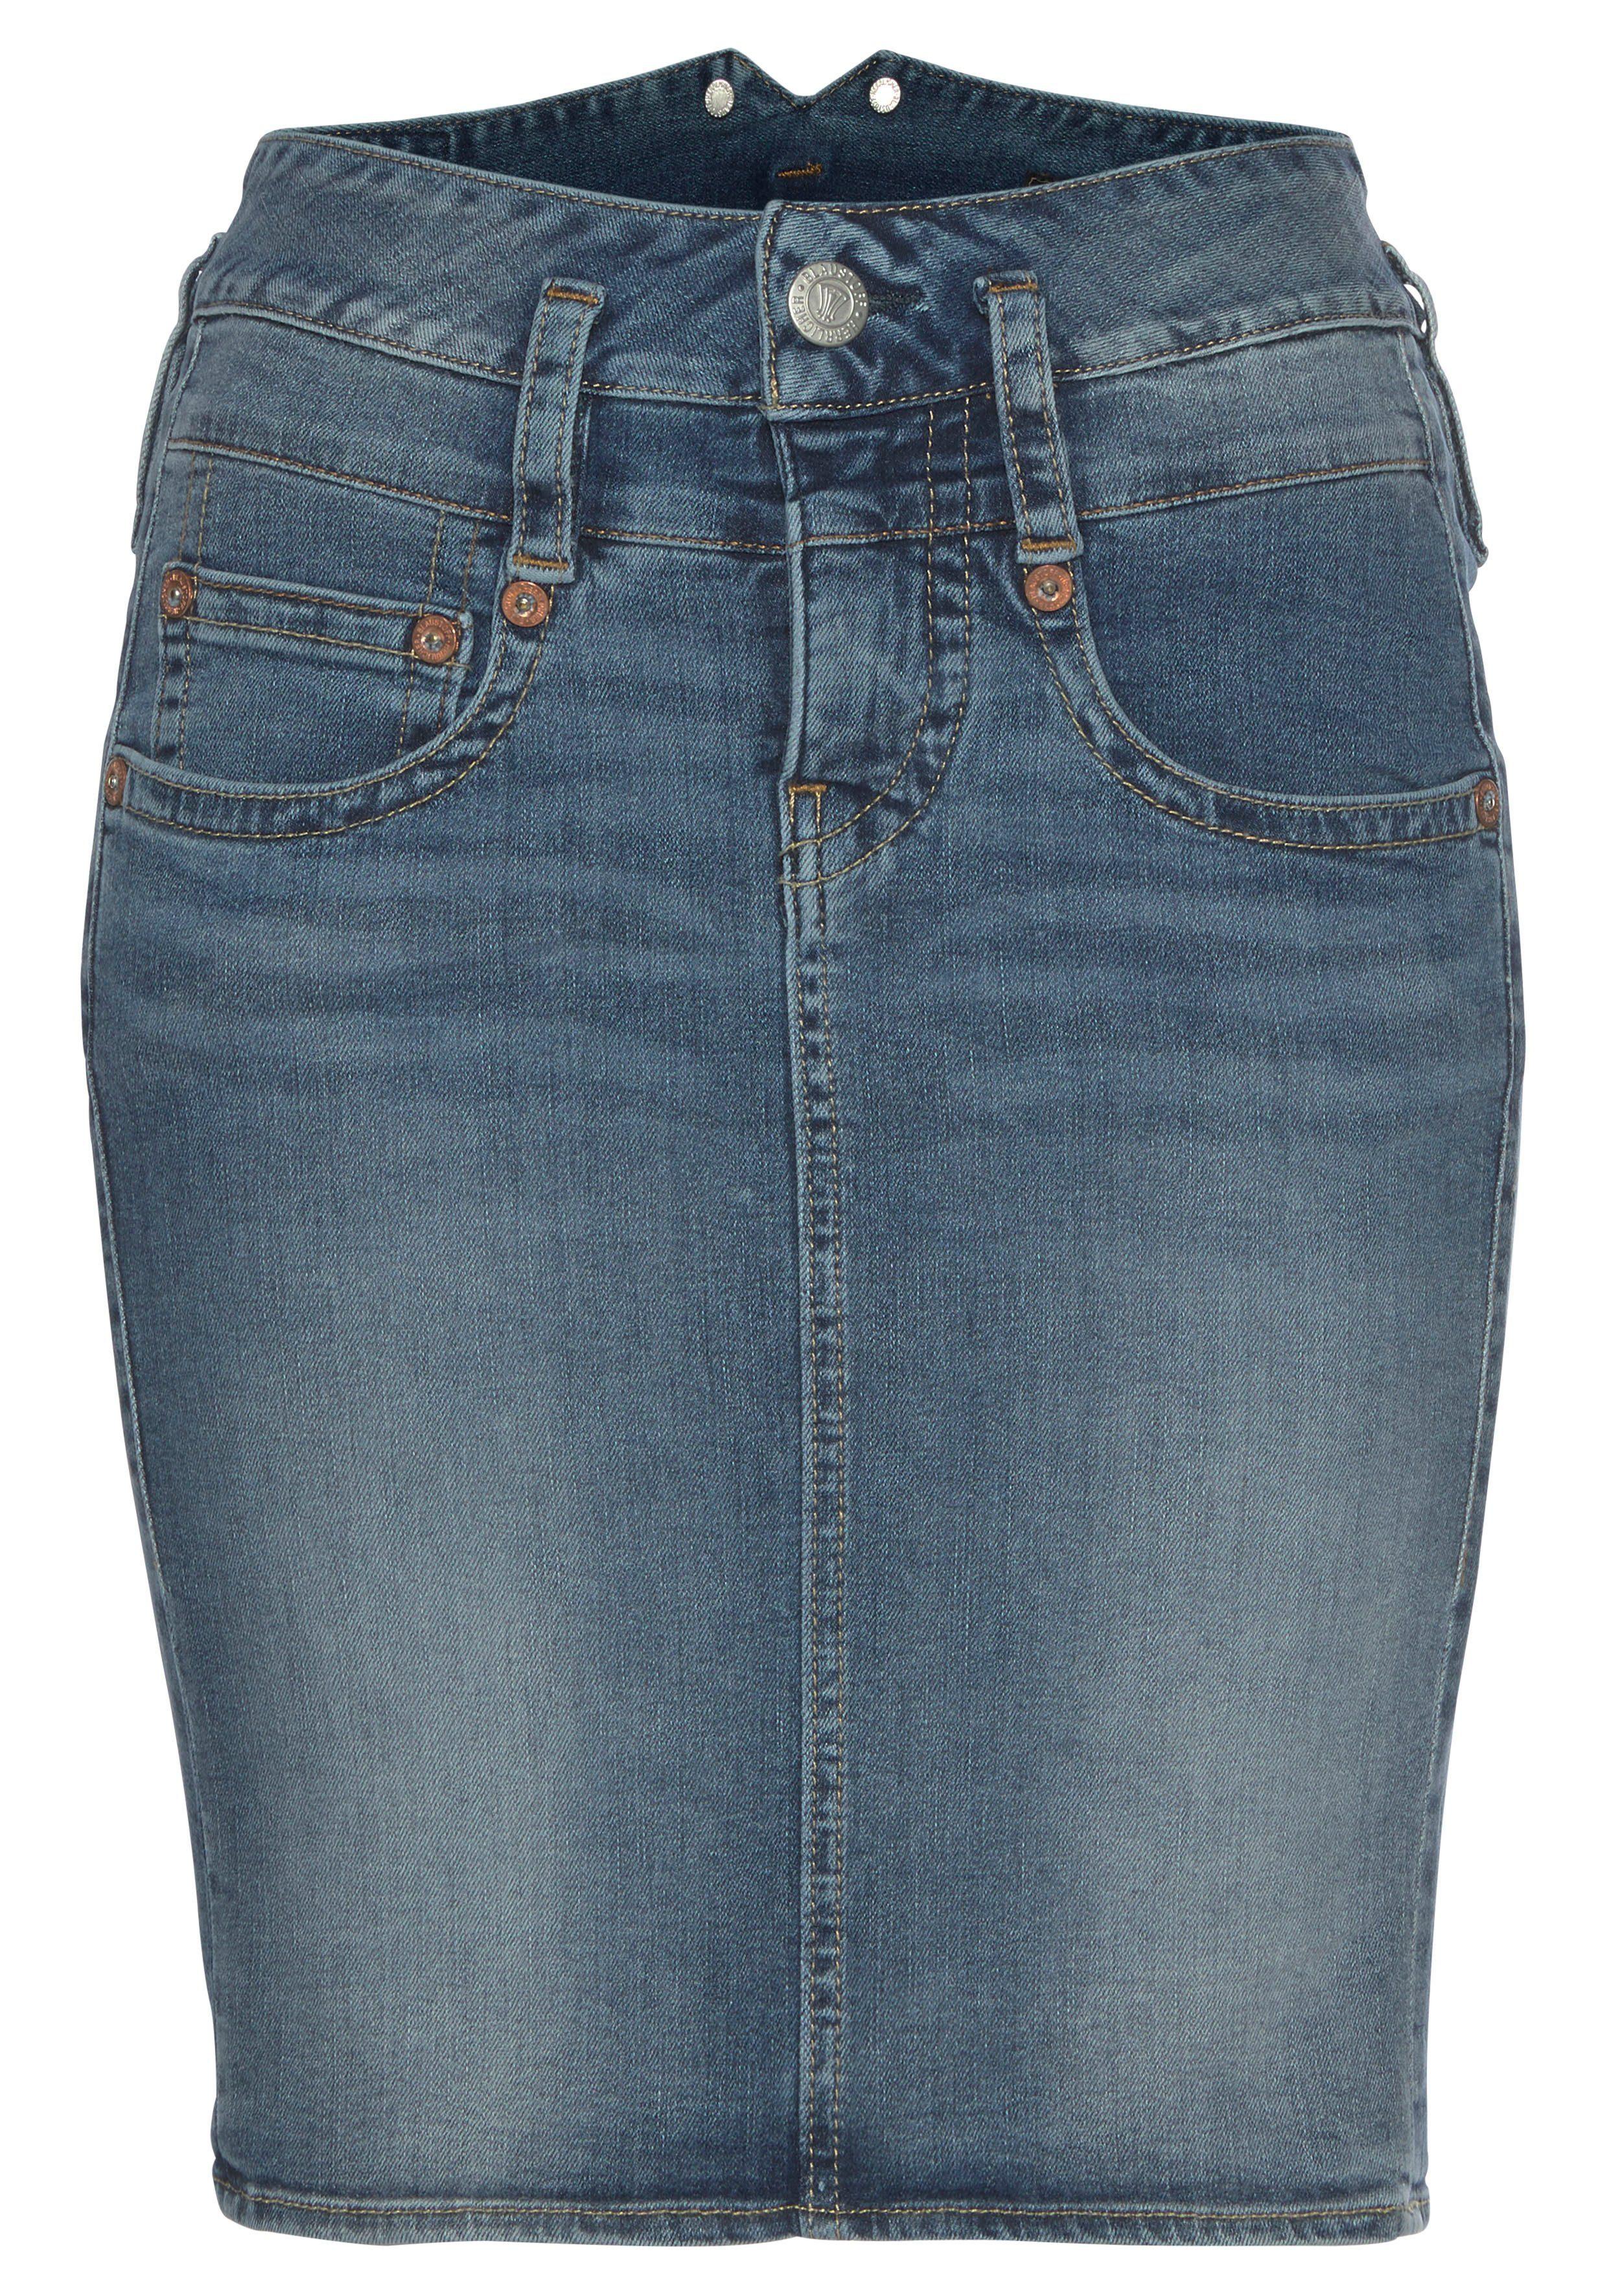 Jeansrock Used-Waschung Kurzer-Rock Minirock Damen Blau Aniston Fashion Trend